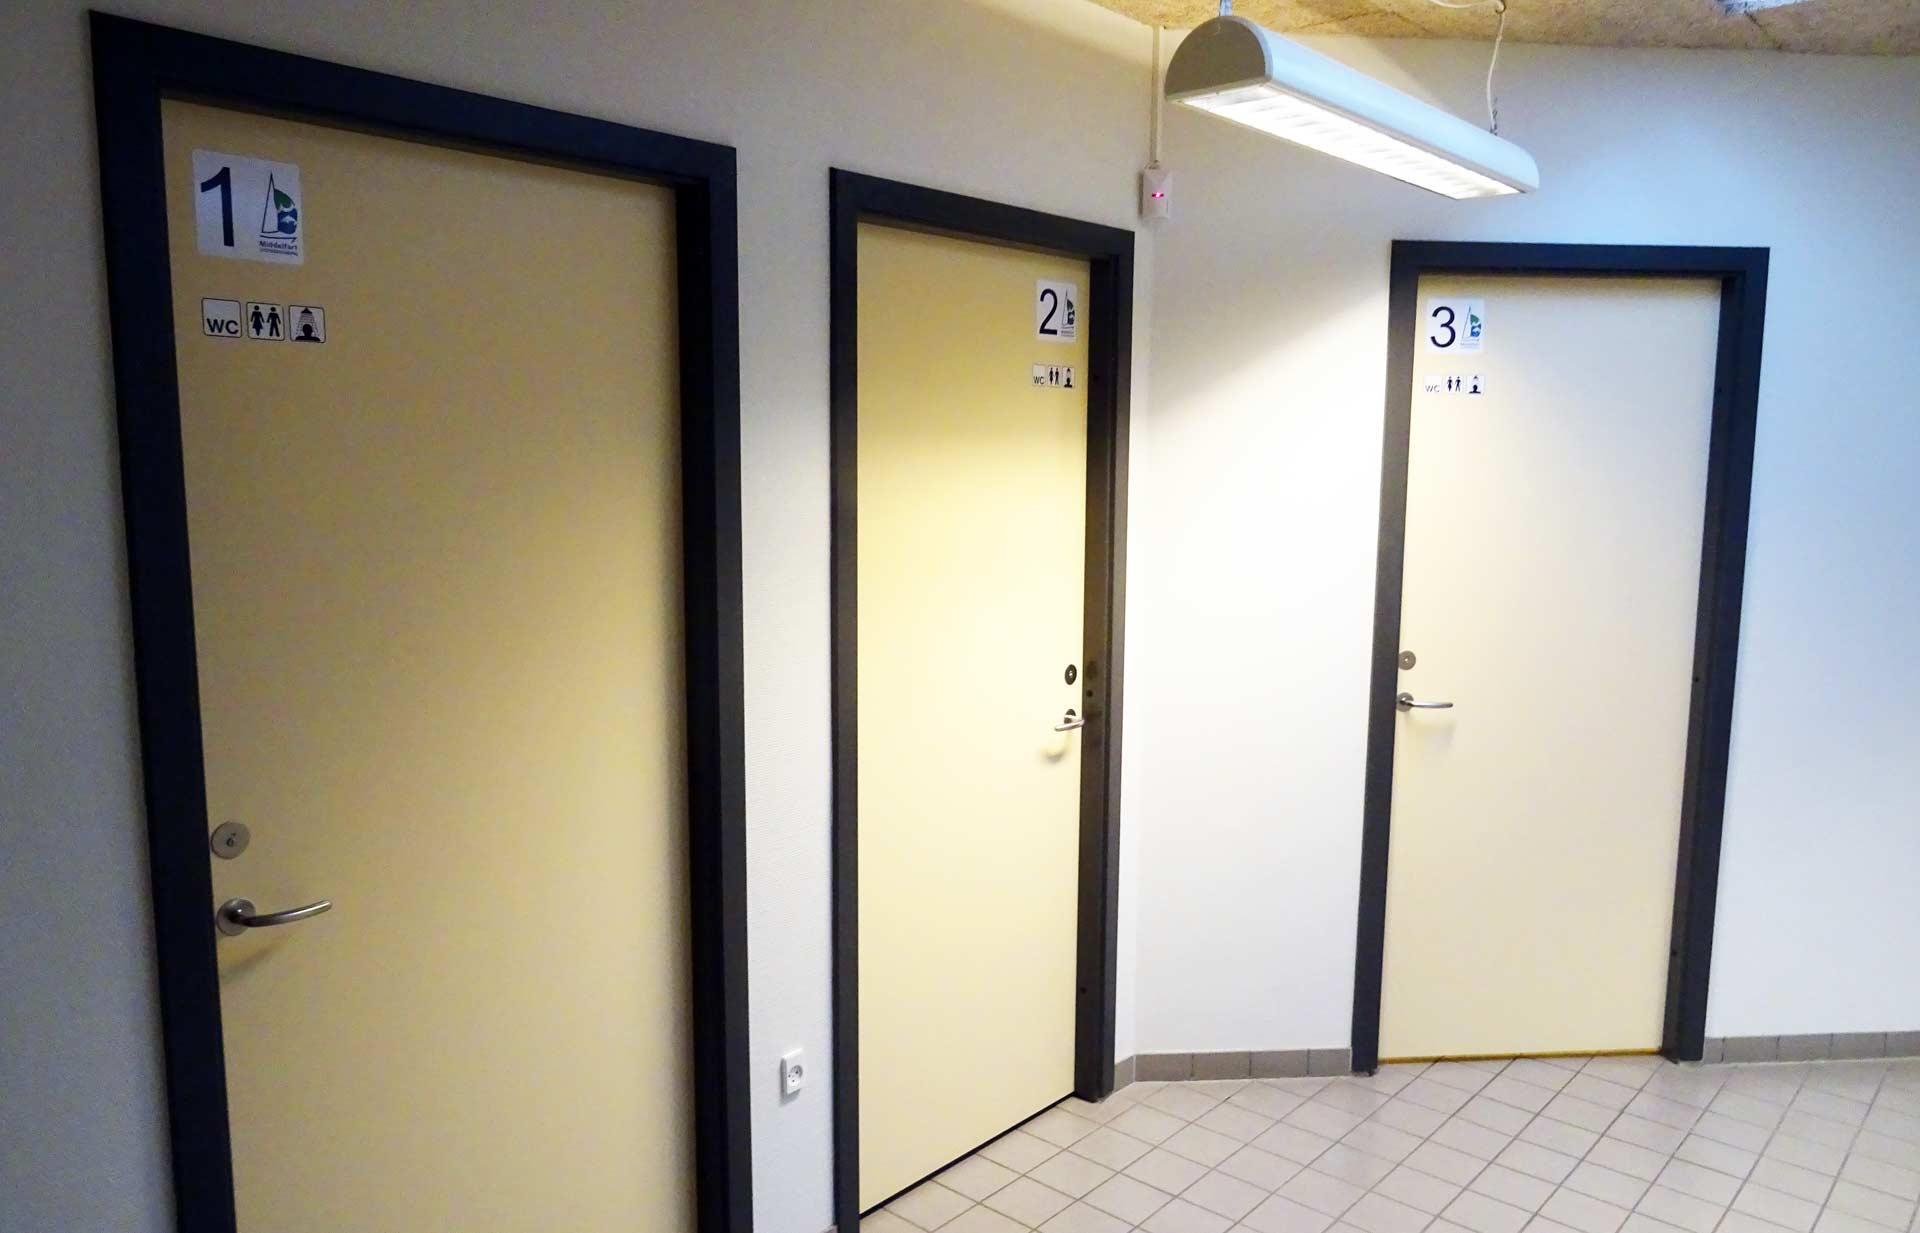 Privacy in the bathroom facilities